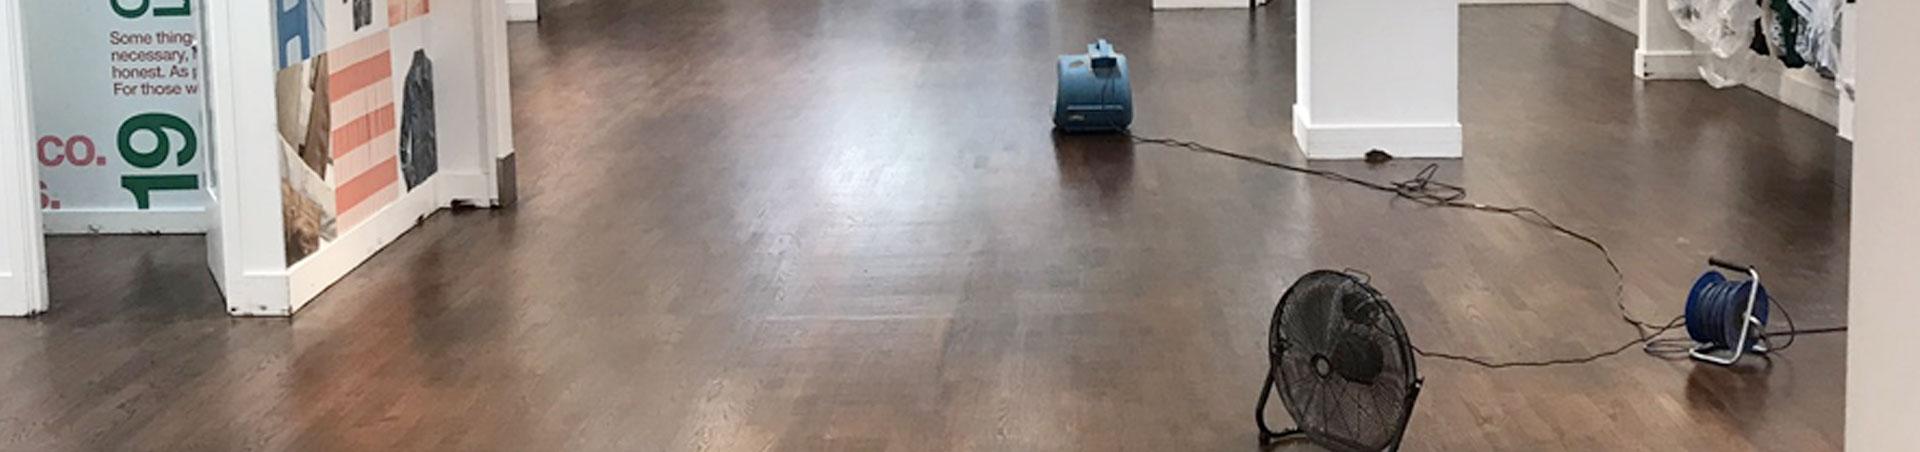 Overnight Floor Sanding